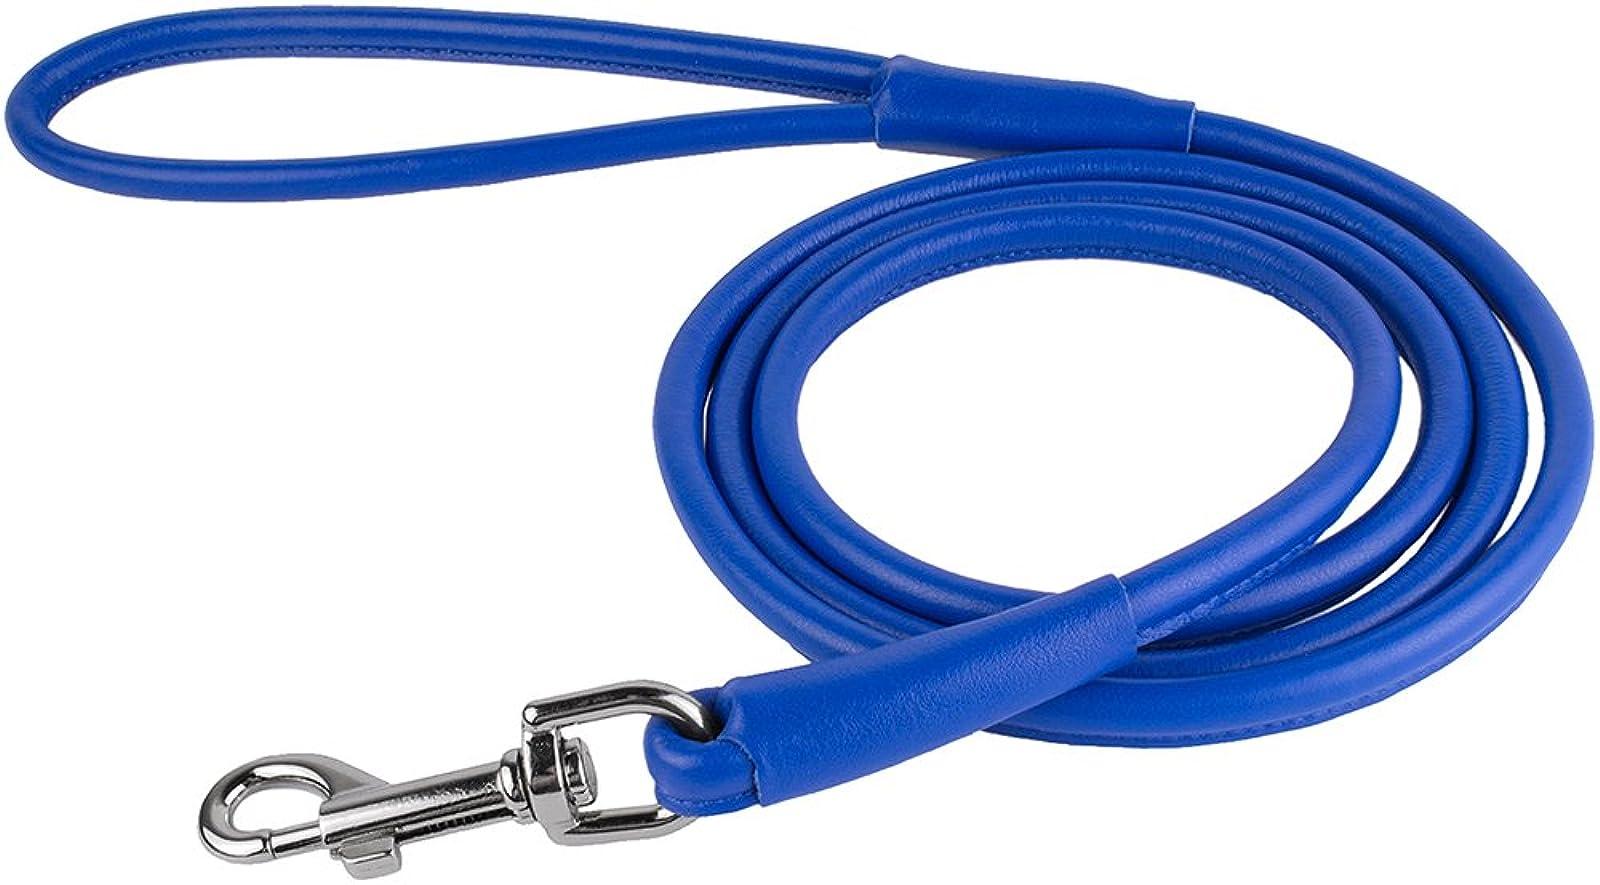 CollarDirect Rolled Leather Dog Leash 4ft Soft - 6